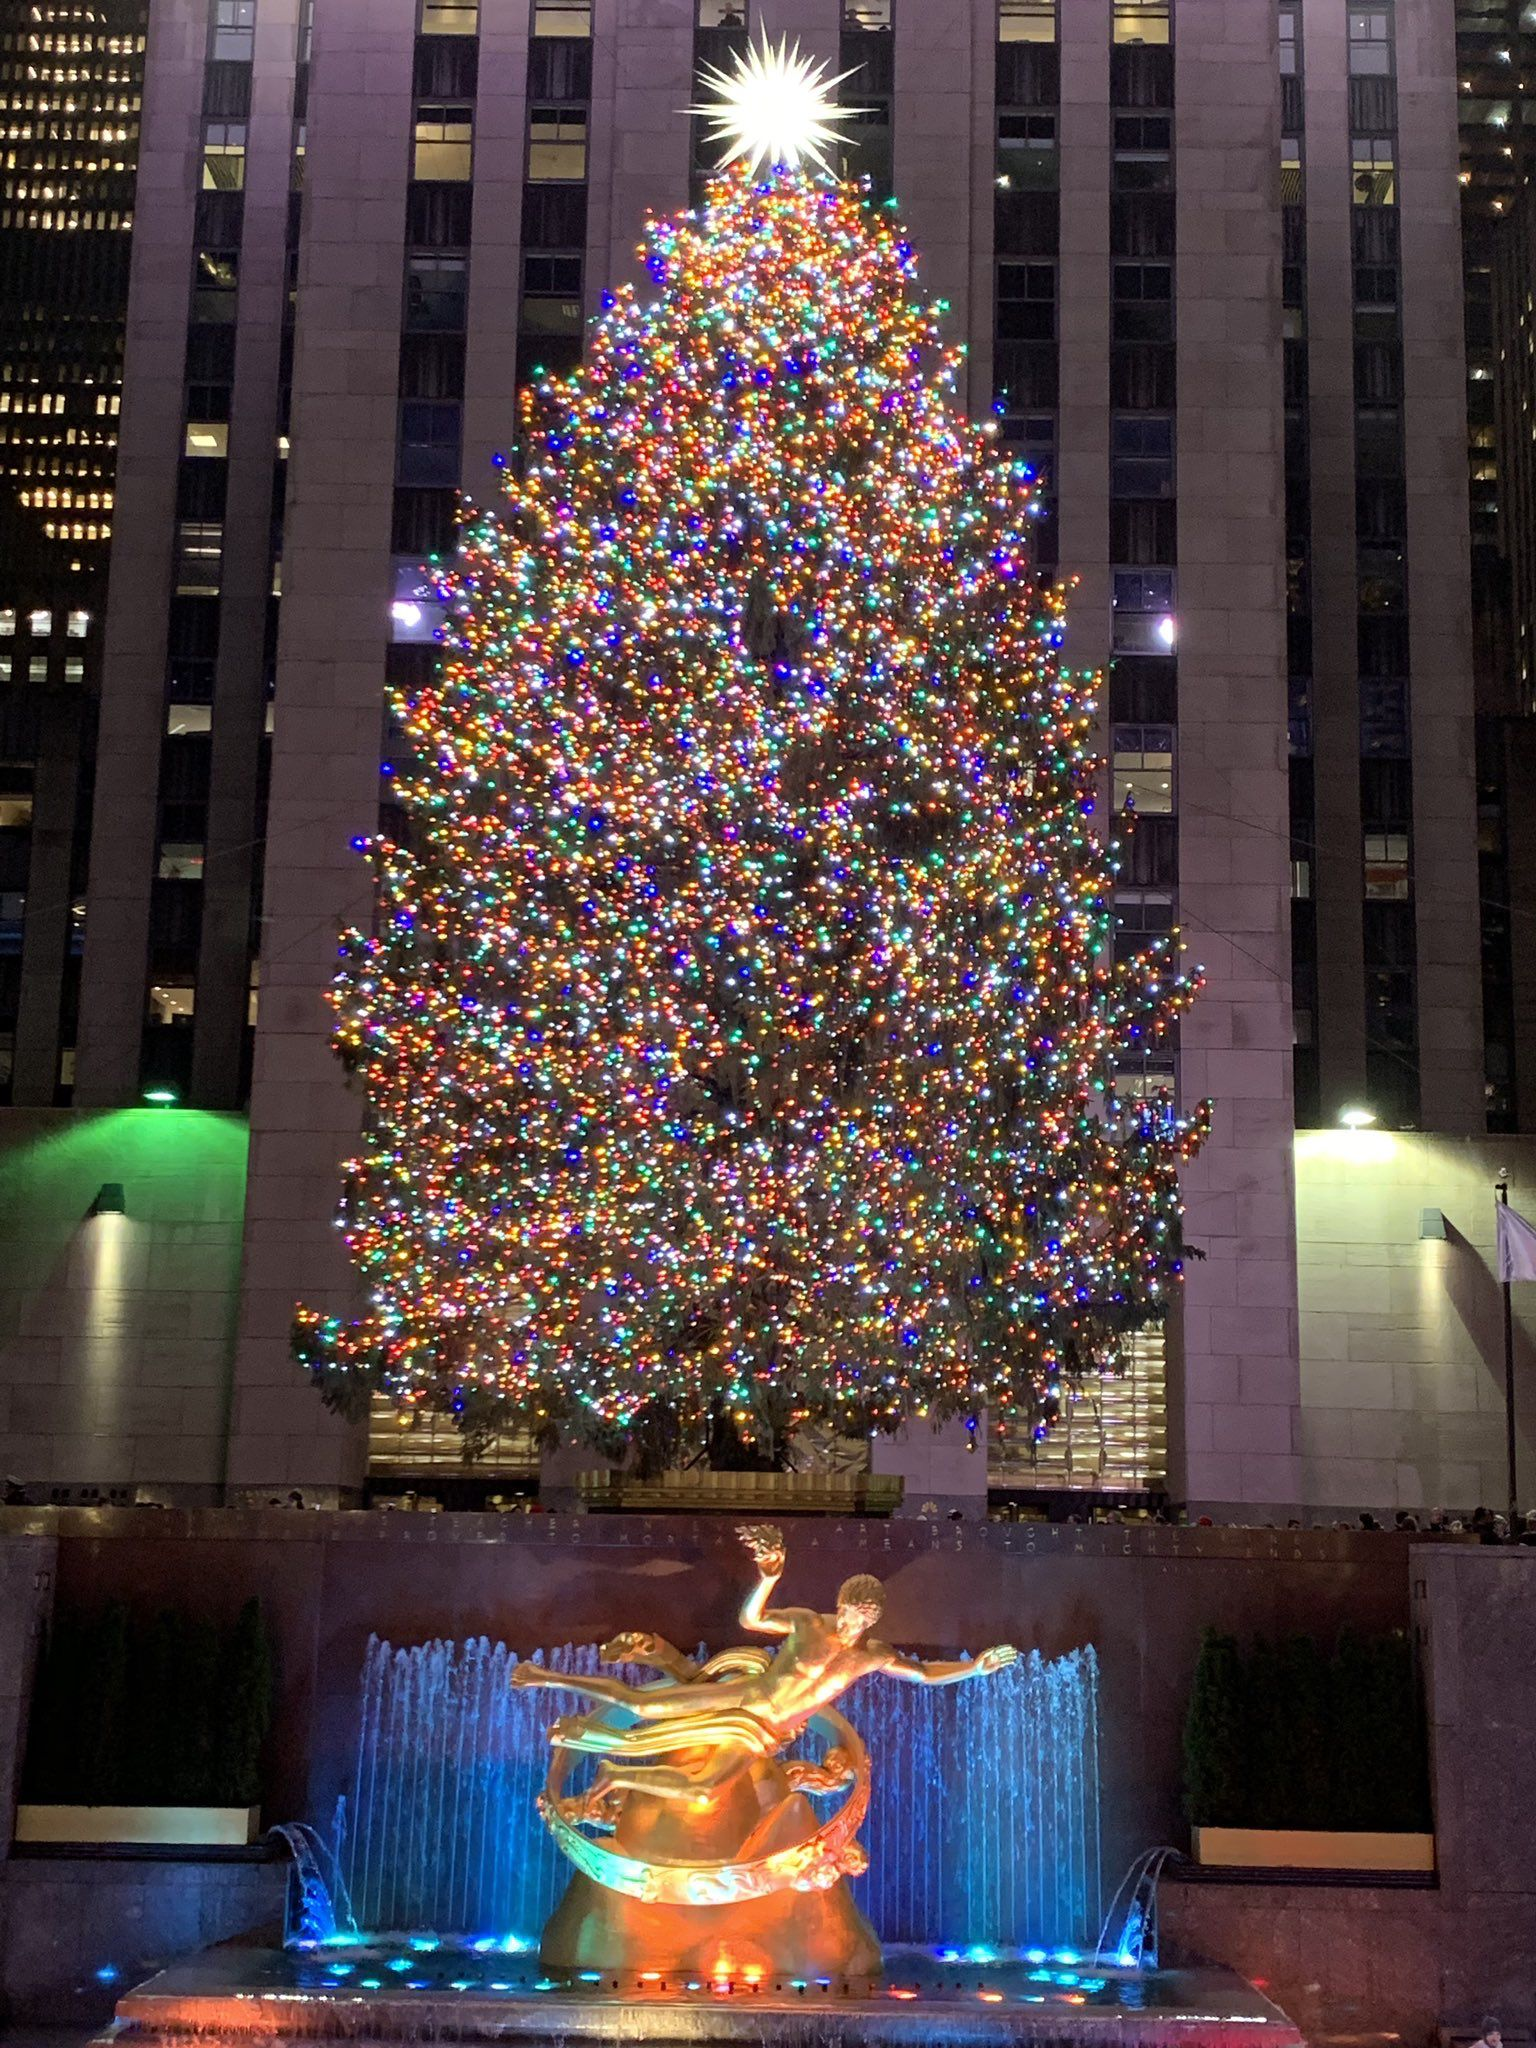 Pin by Daisy Rodriguez on ♥️#ChristmasSeason 2018 #NYC #USA | New york christmas, New york city ...